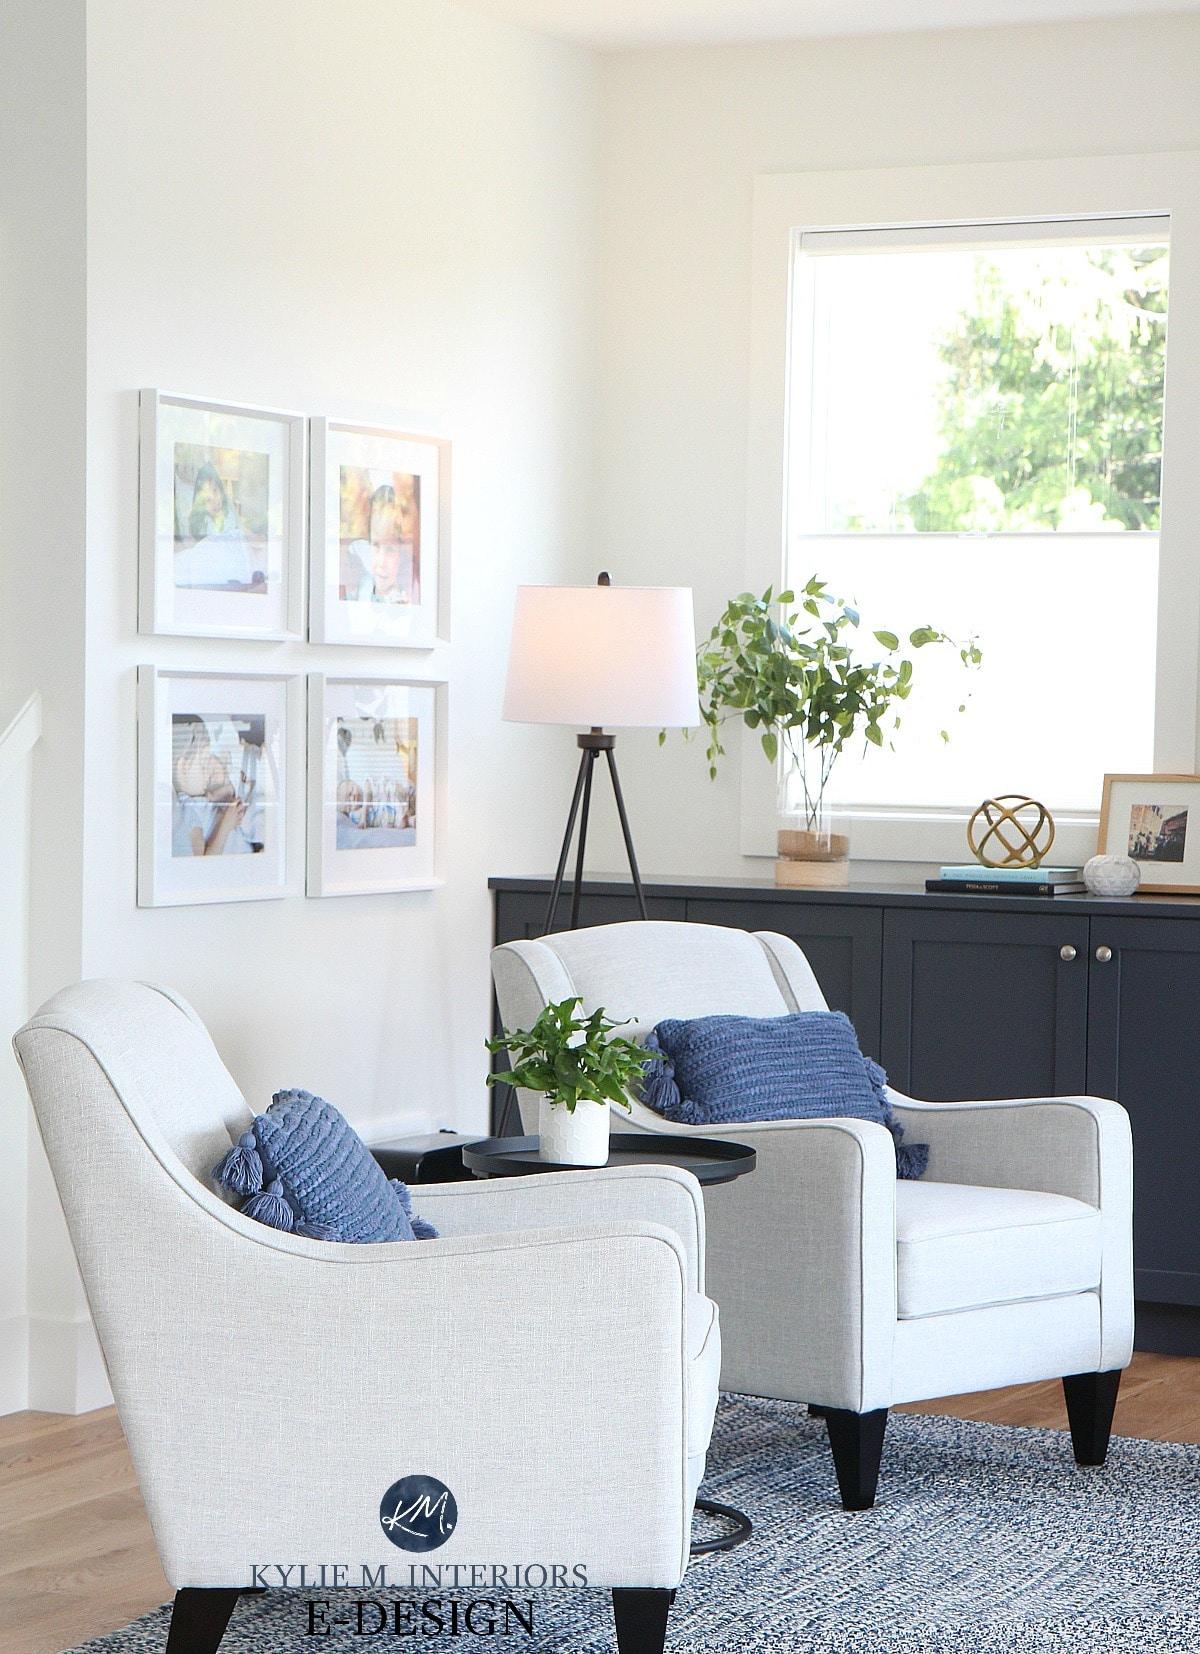 Design My Living Room Online: Kylie M Interiors, Edesign, Online Paint Colour Consultant